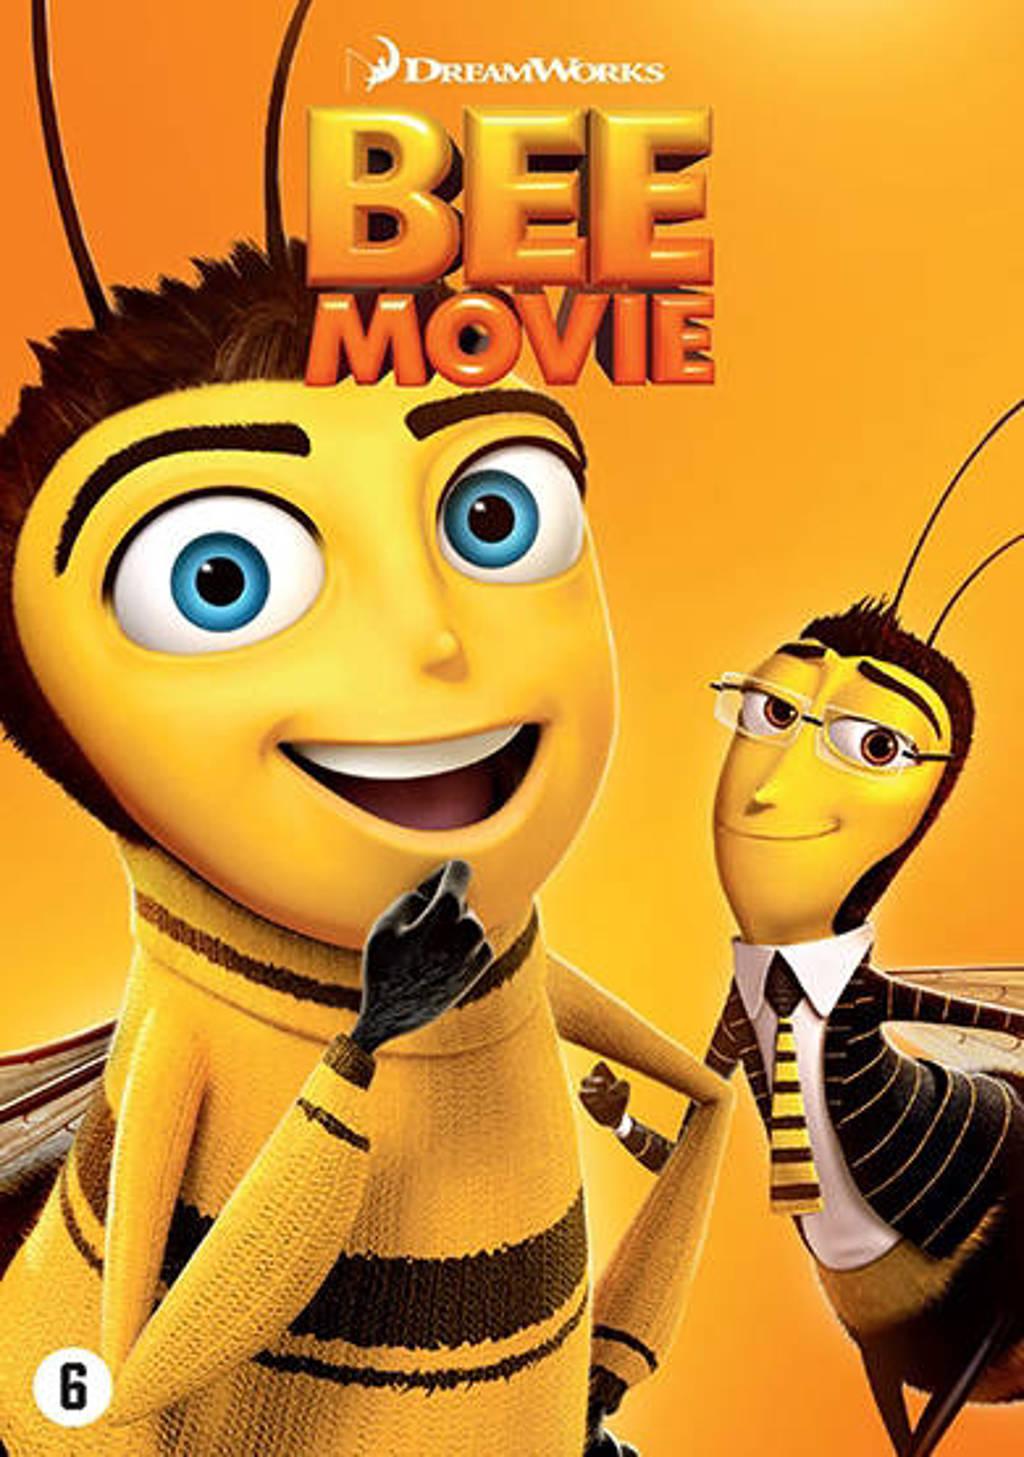 Bee movie  (DVD)